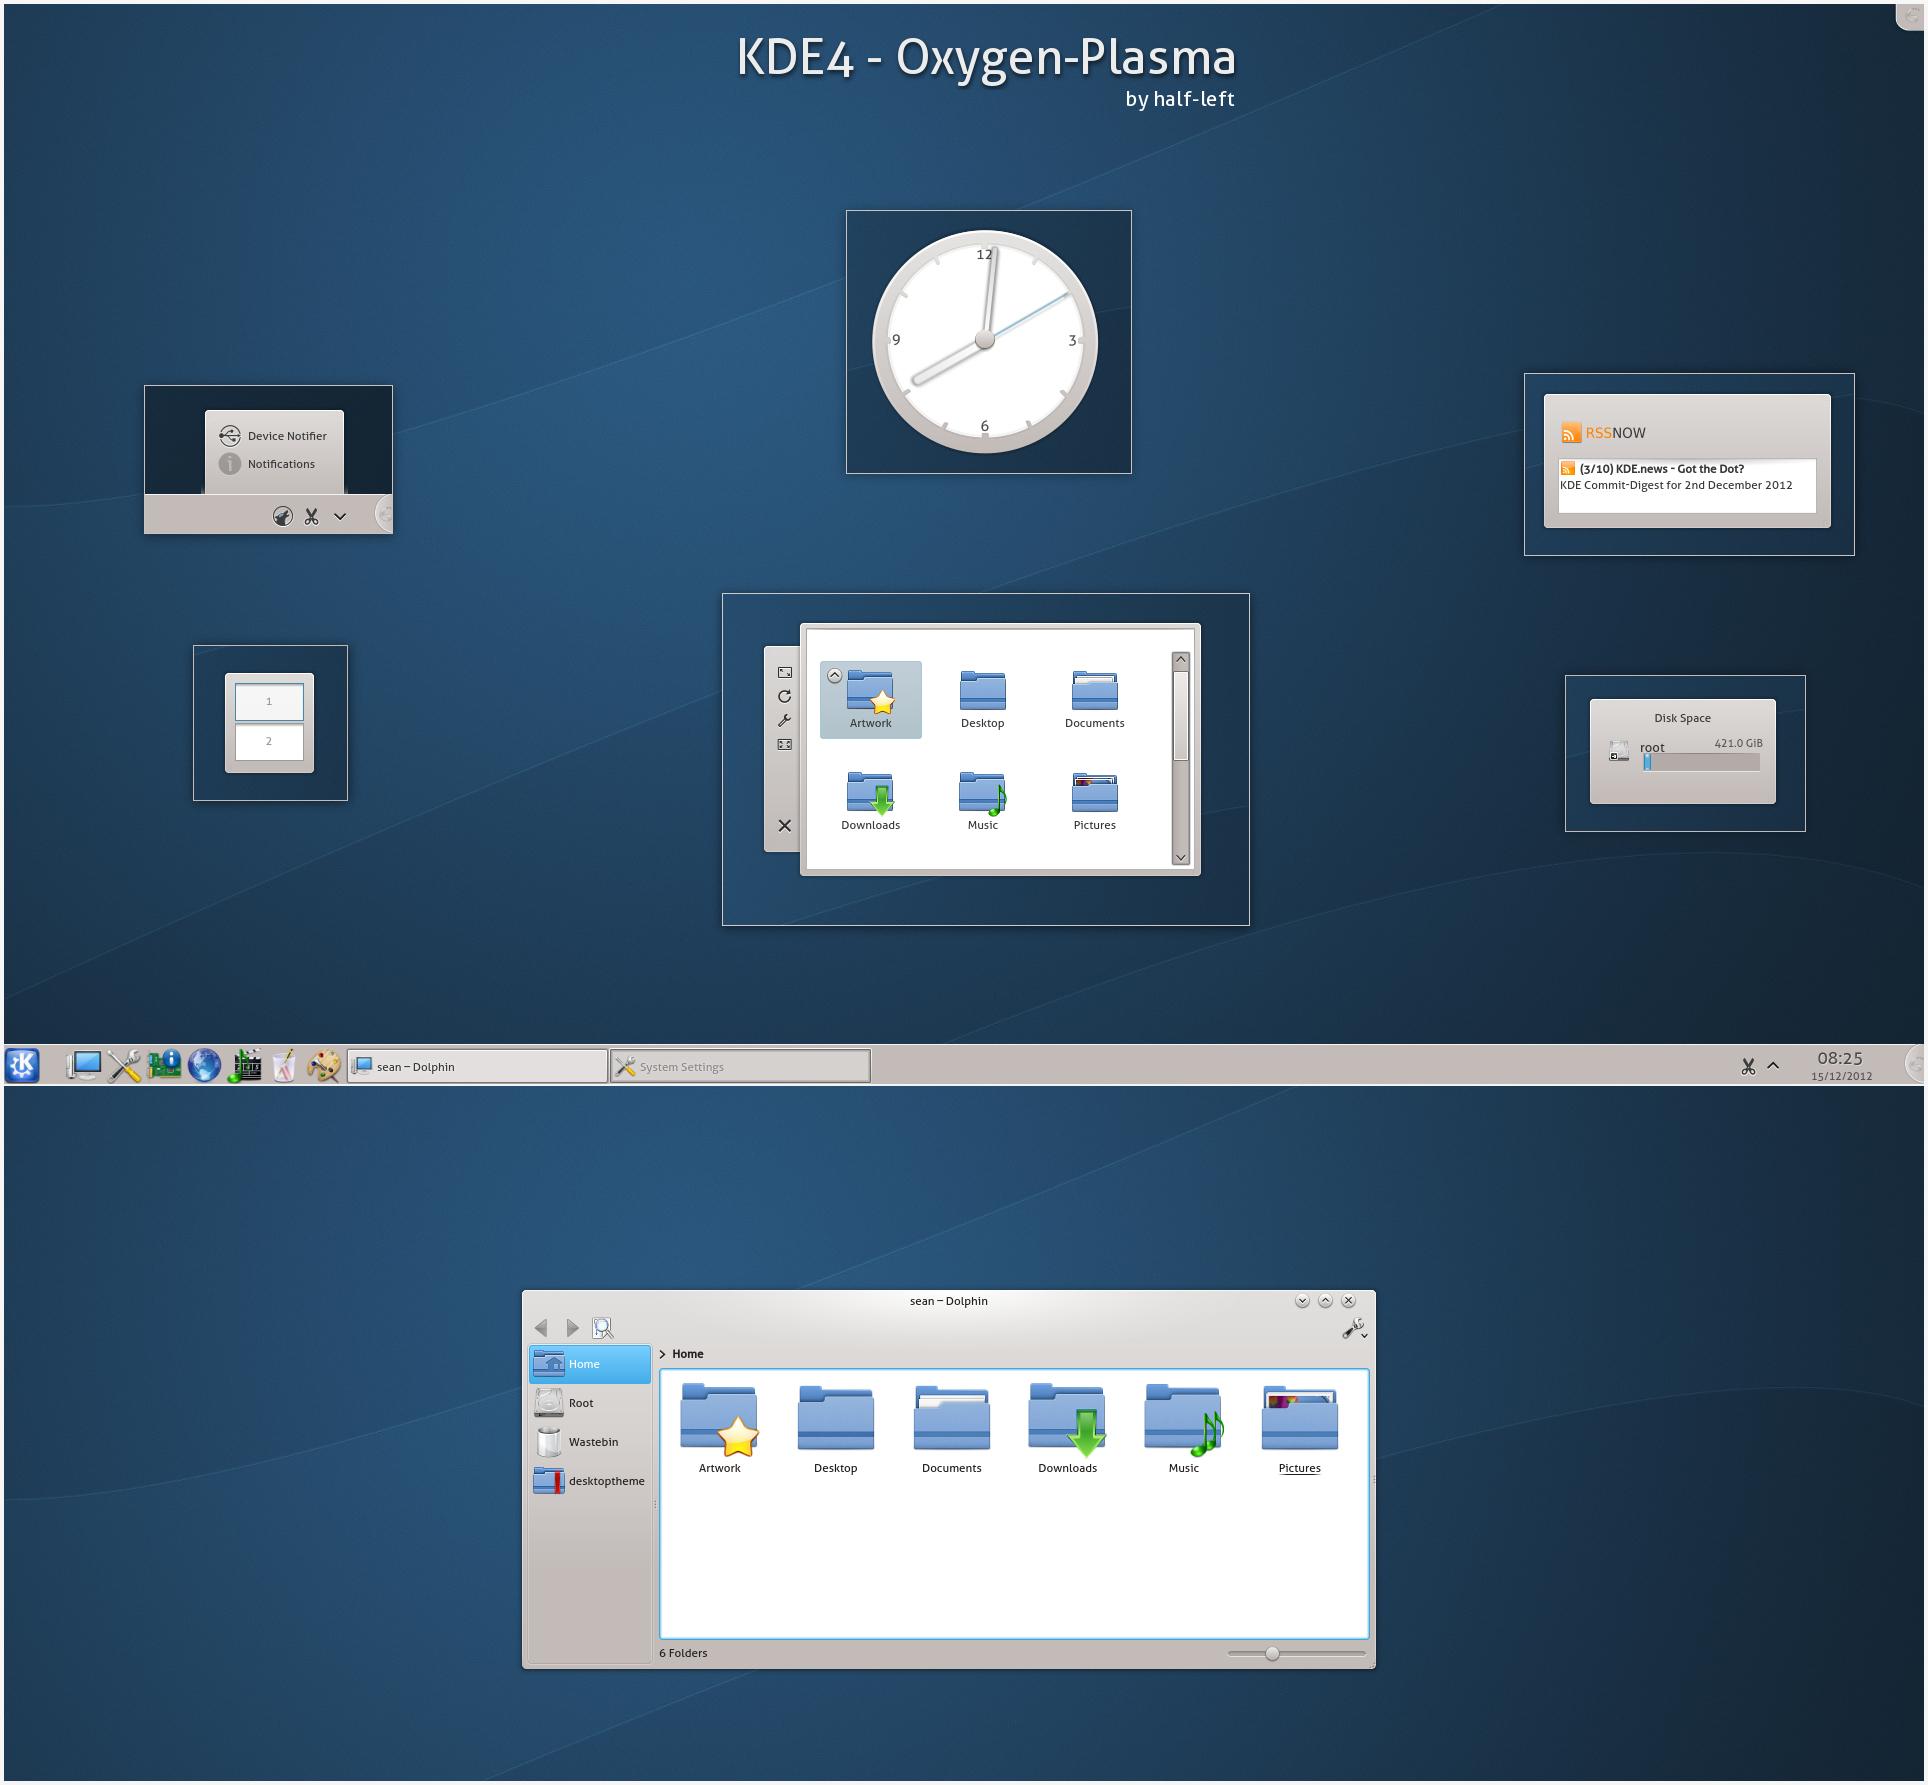 KDE4 - Oxygen-Plasma